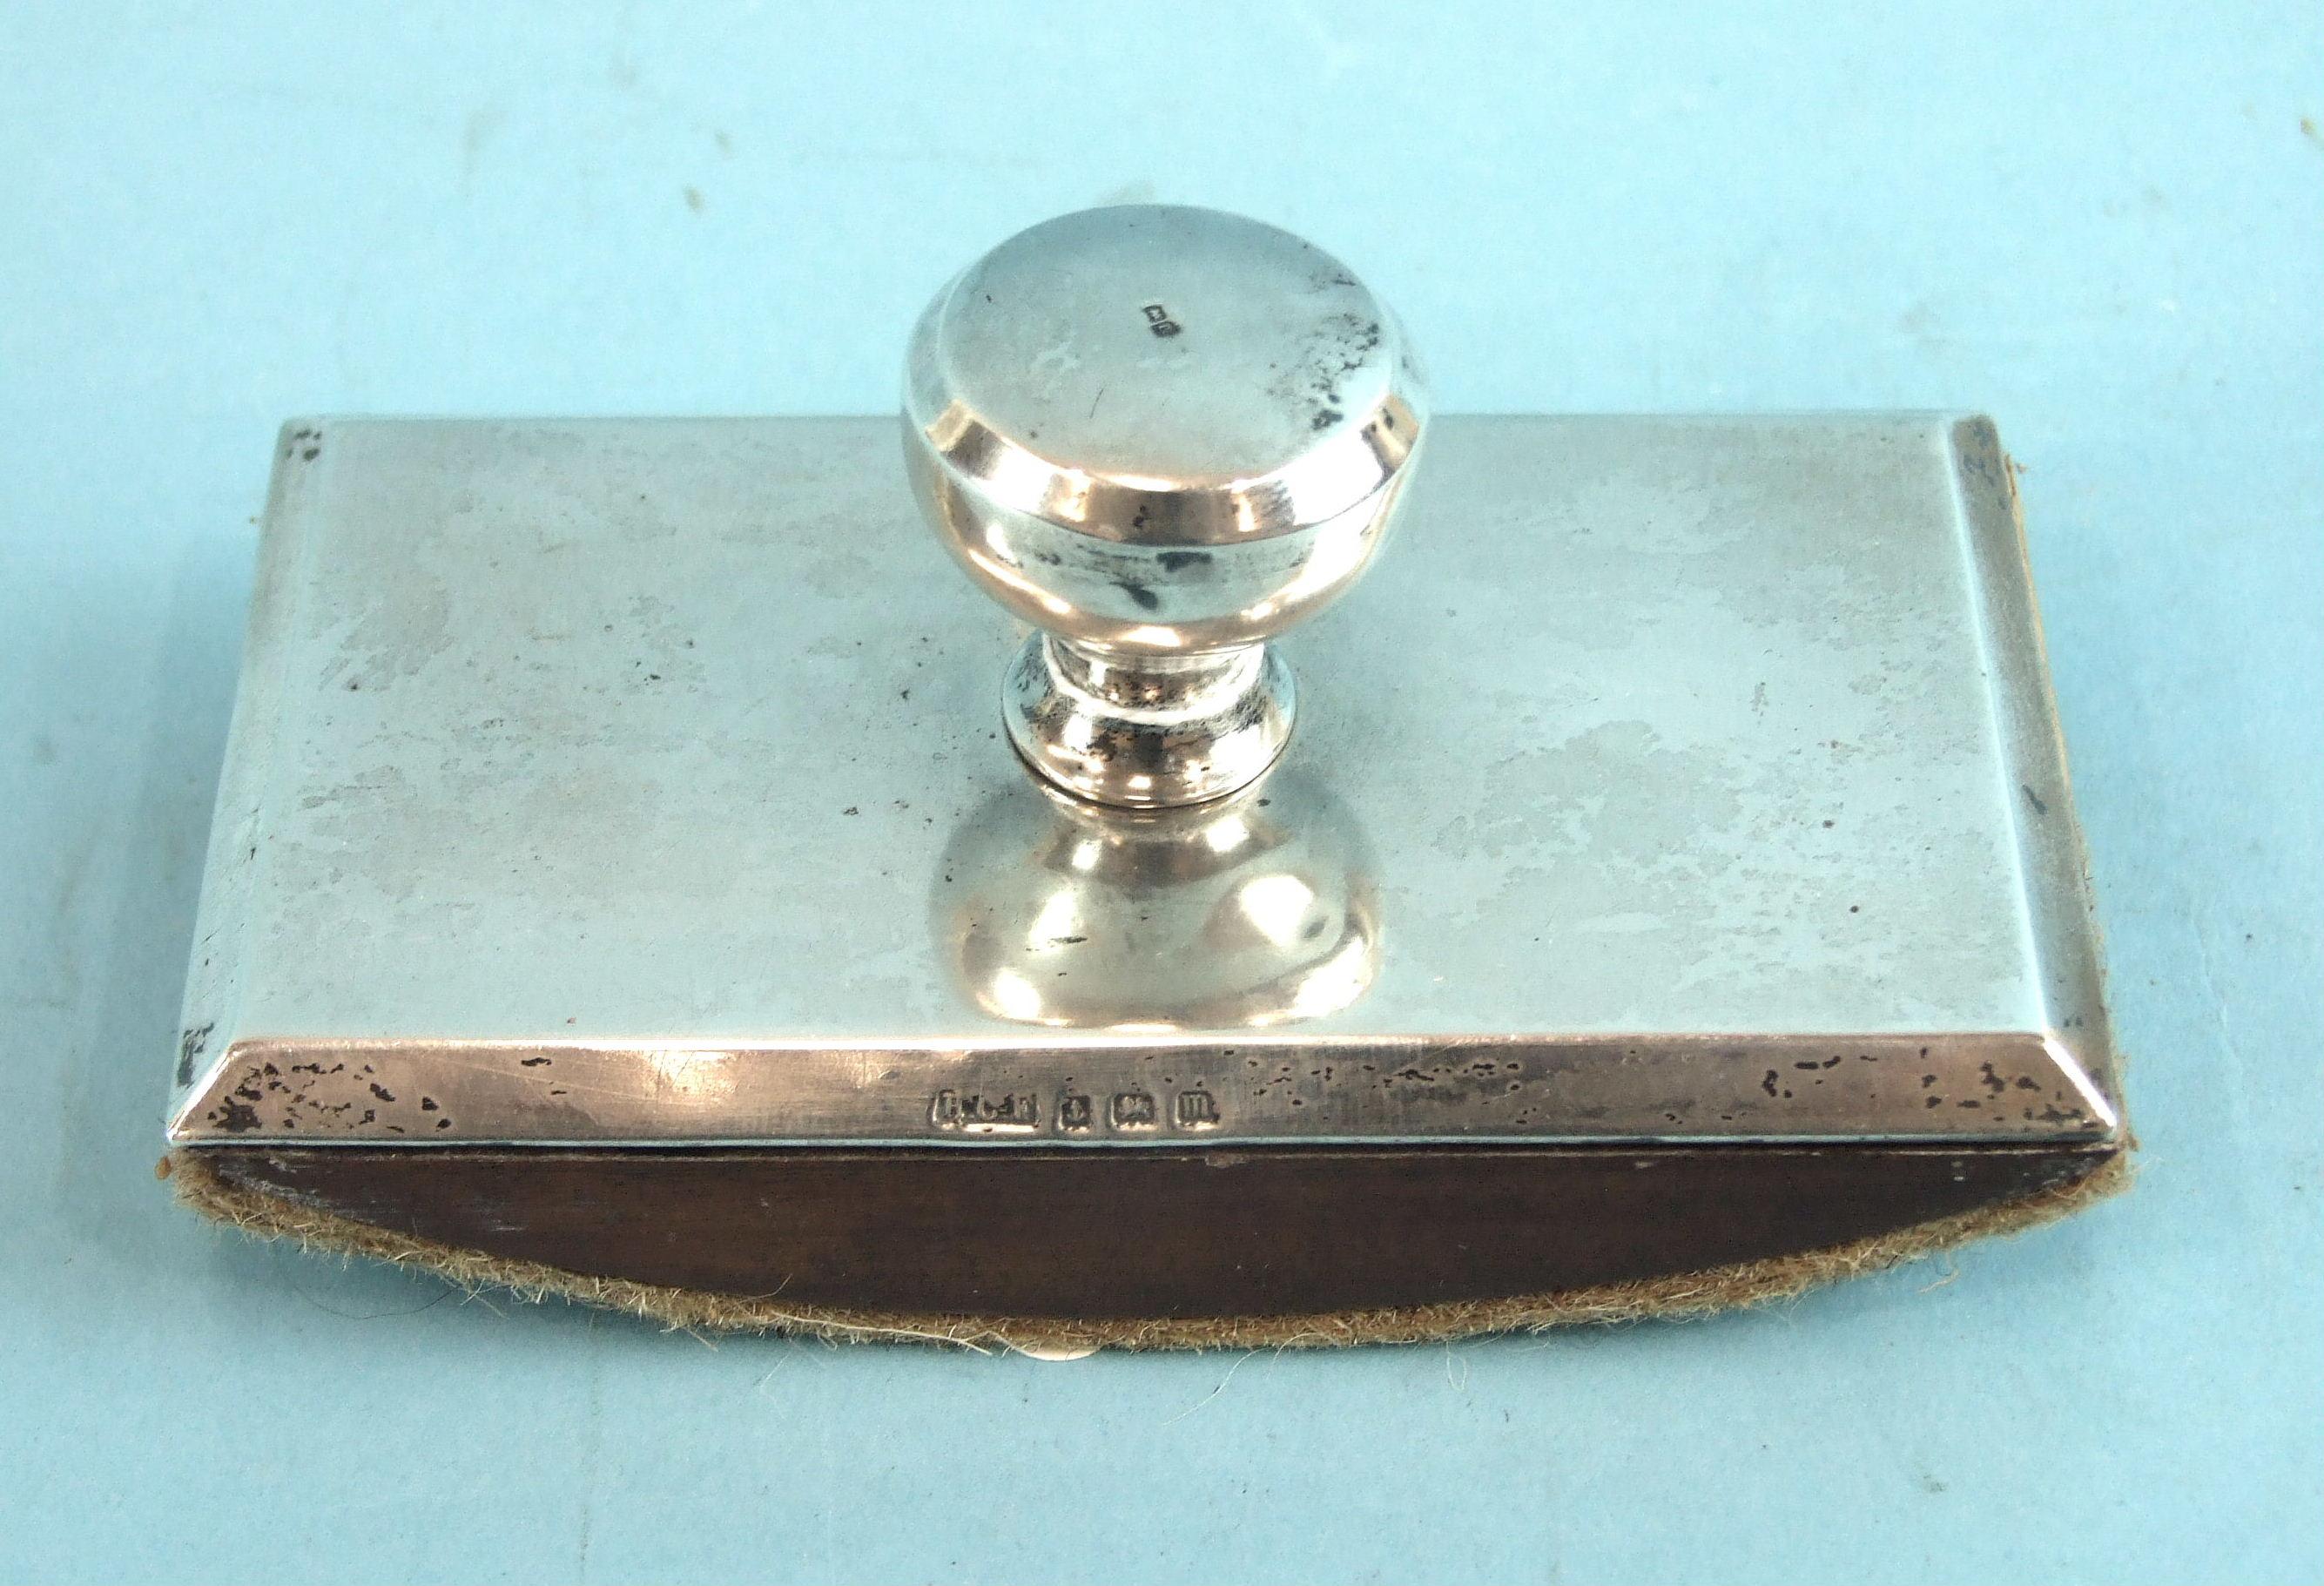 Lot 496 - A plain silver-topped blotter, Birmingham 1911, maker Henry Freeman, 11.5 x 6cm.